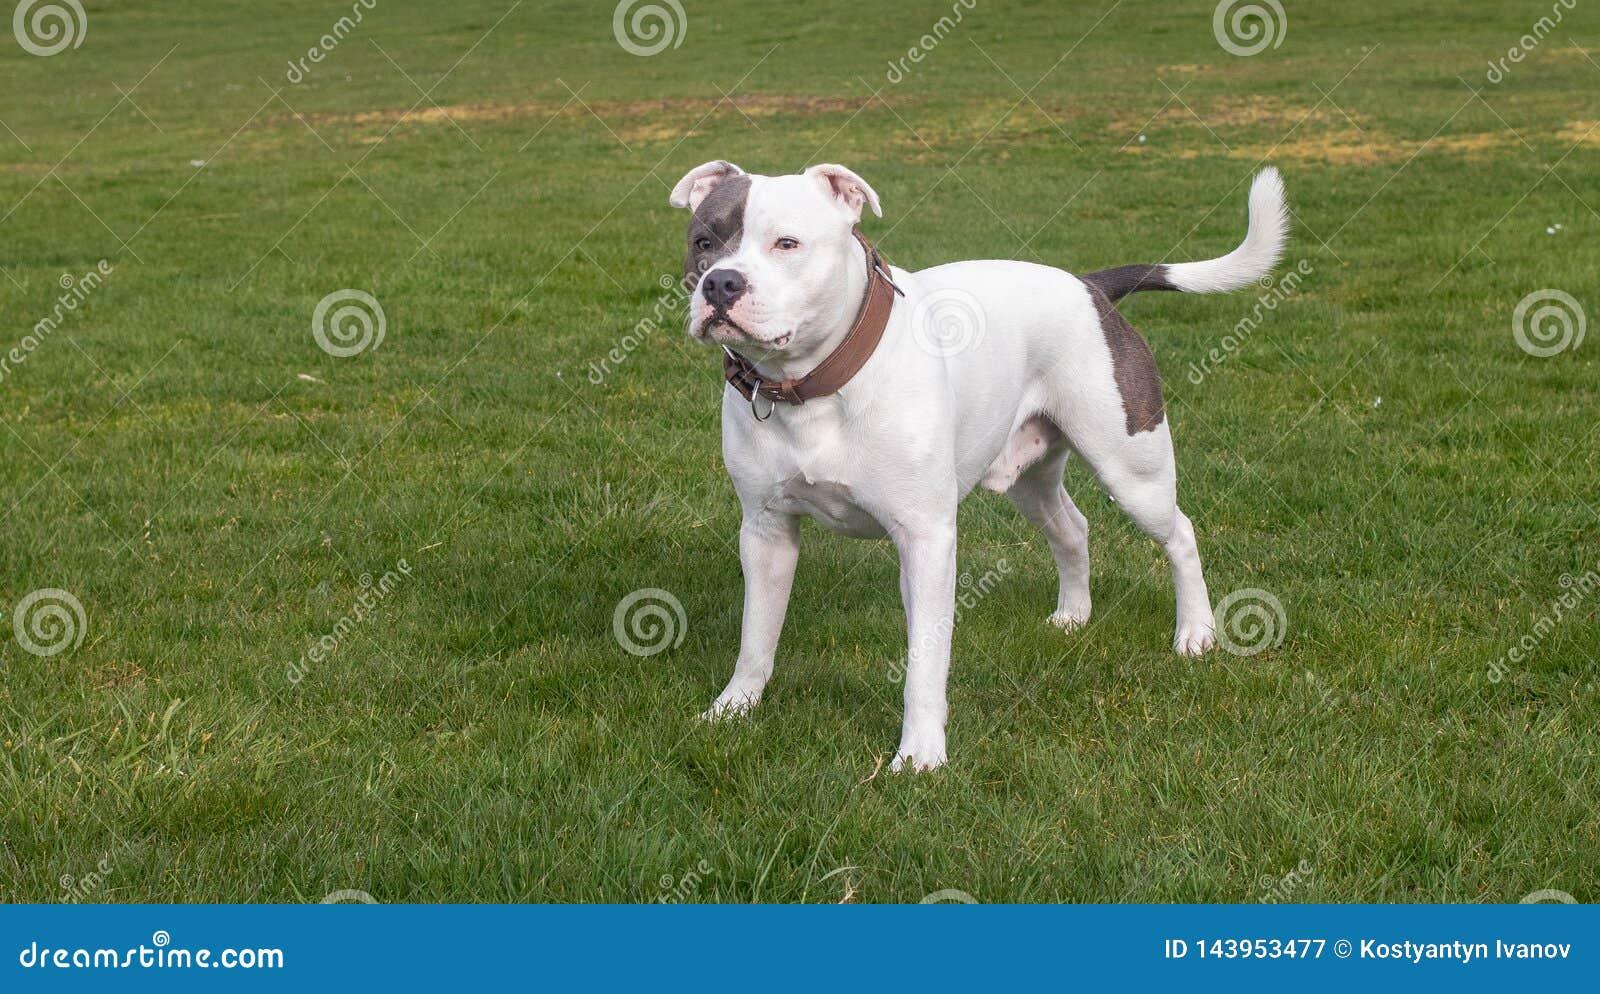 Staffordshire Bull Terrier Dog walking in park